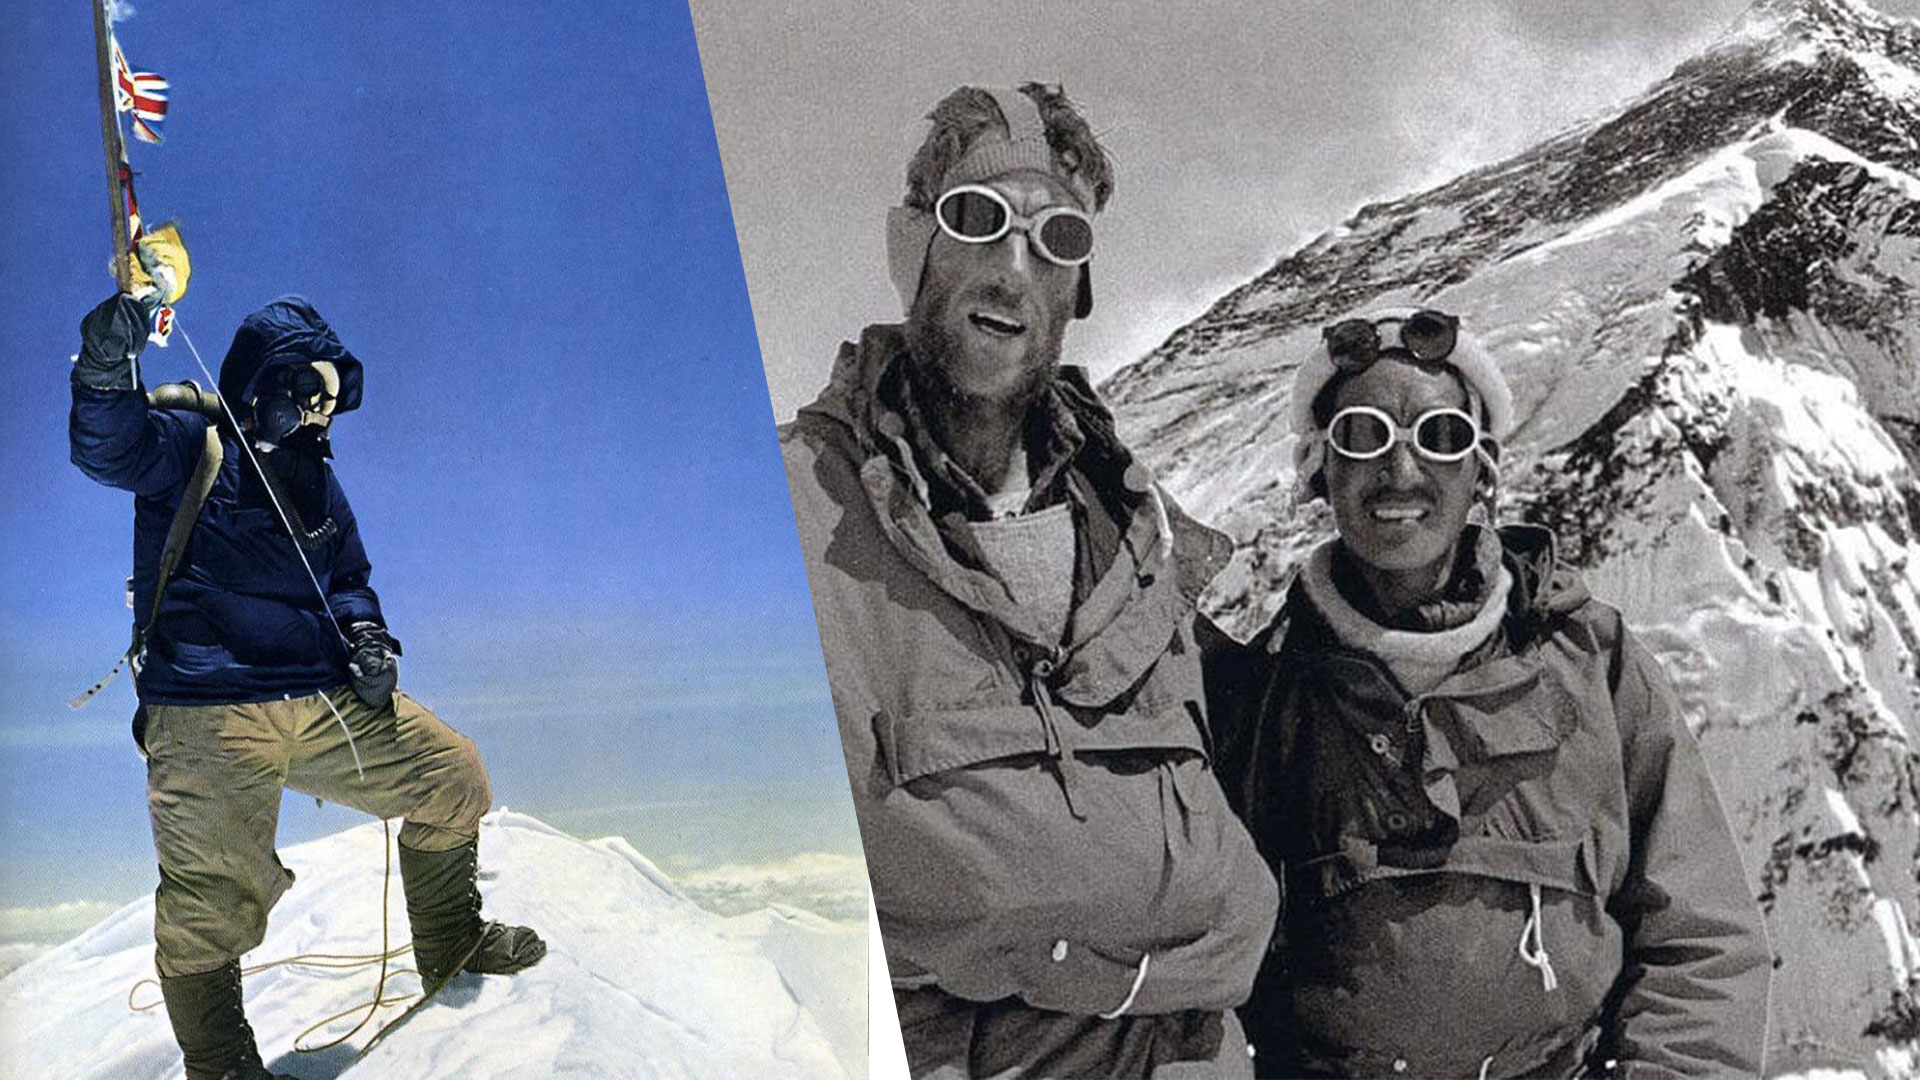 Tenzing Norgay Biography | The Sherpa Legend - Mpora